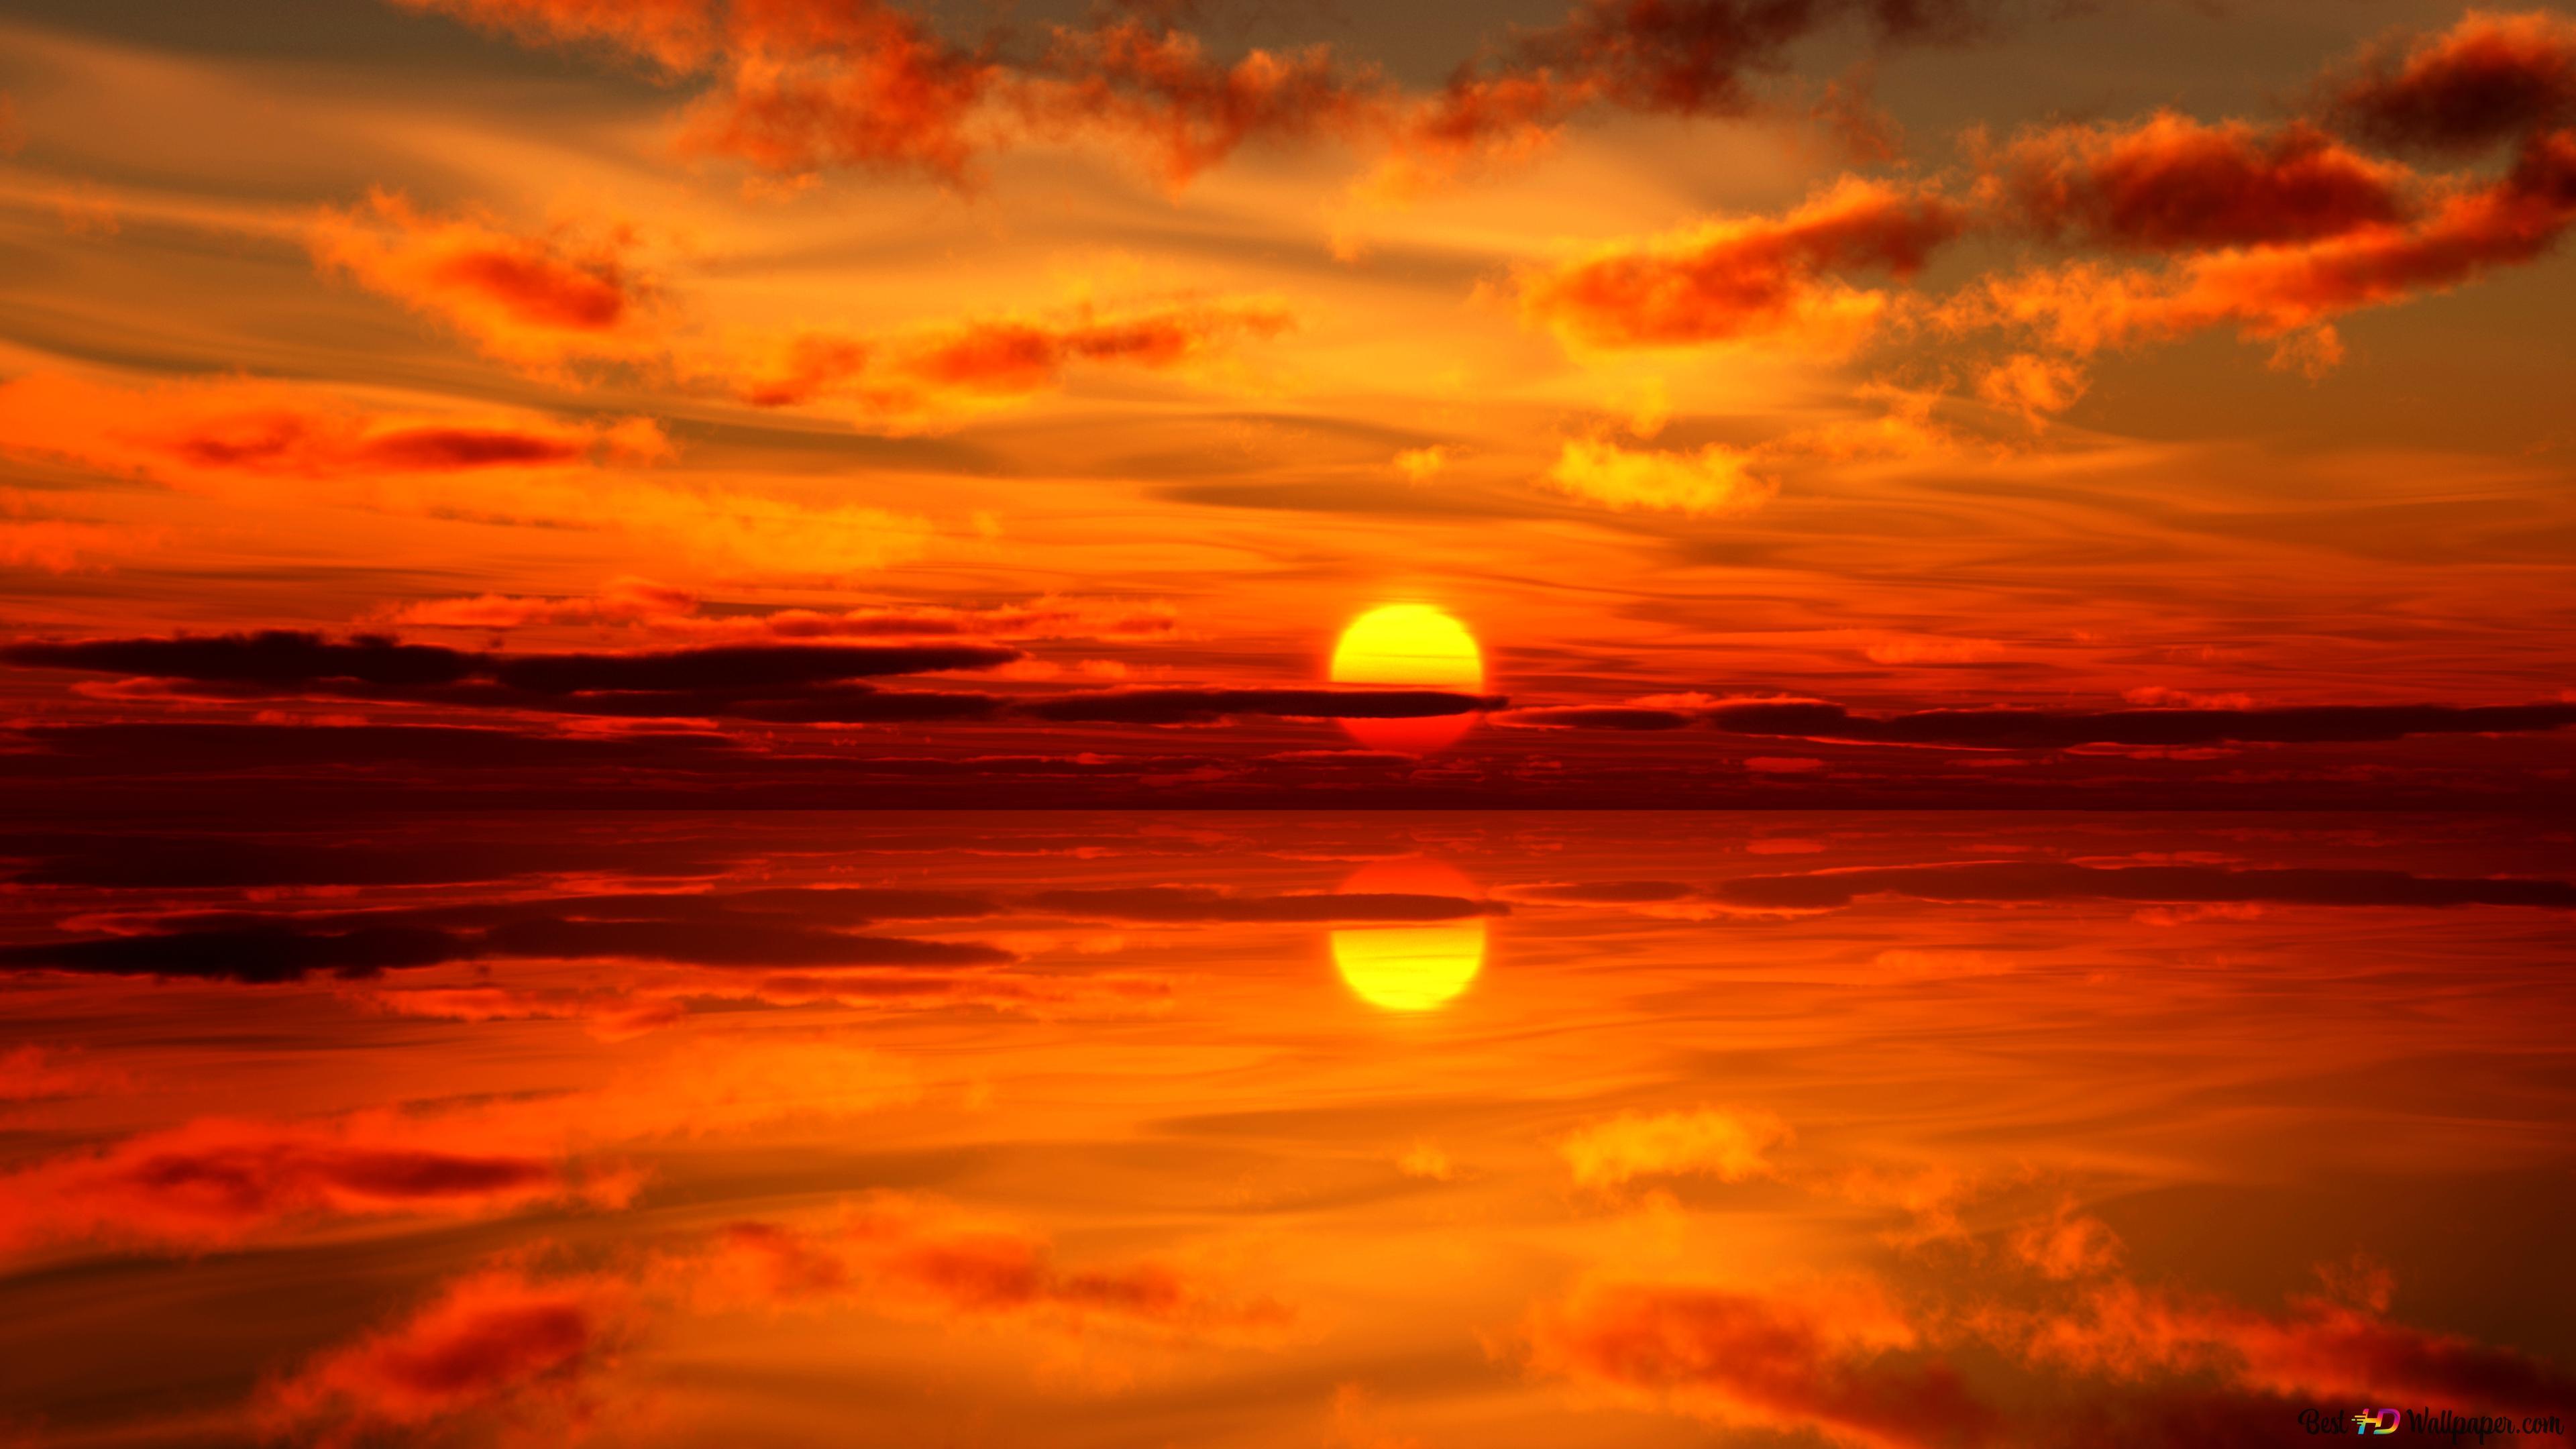 Beautiful Sunset And Reflection Hd Wallpaper Download